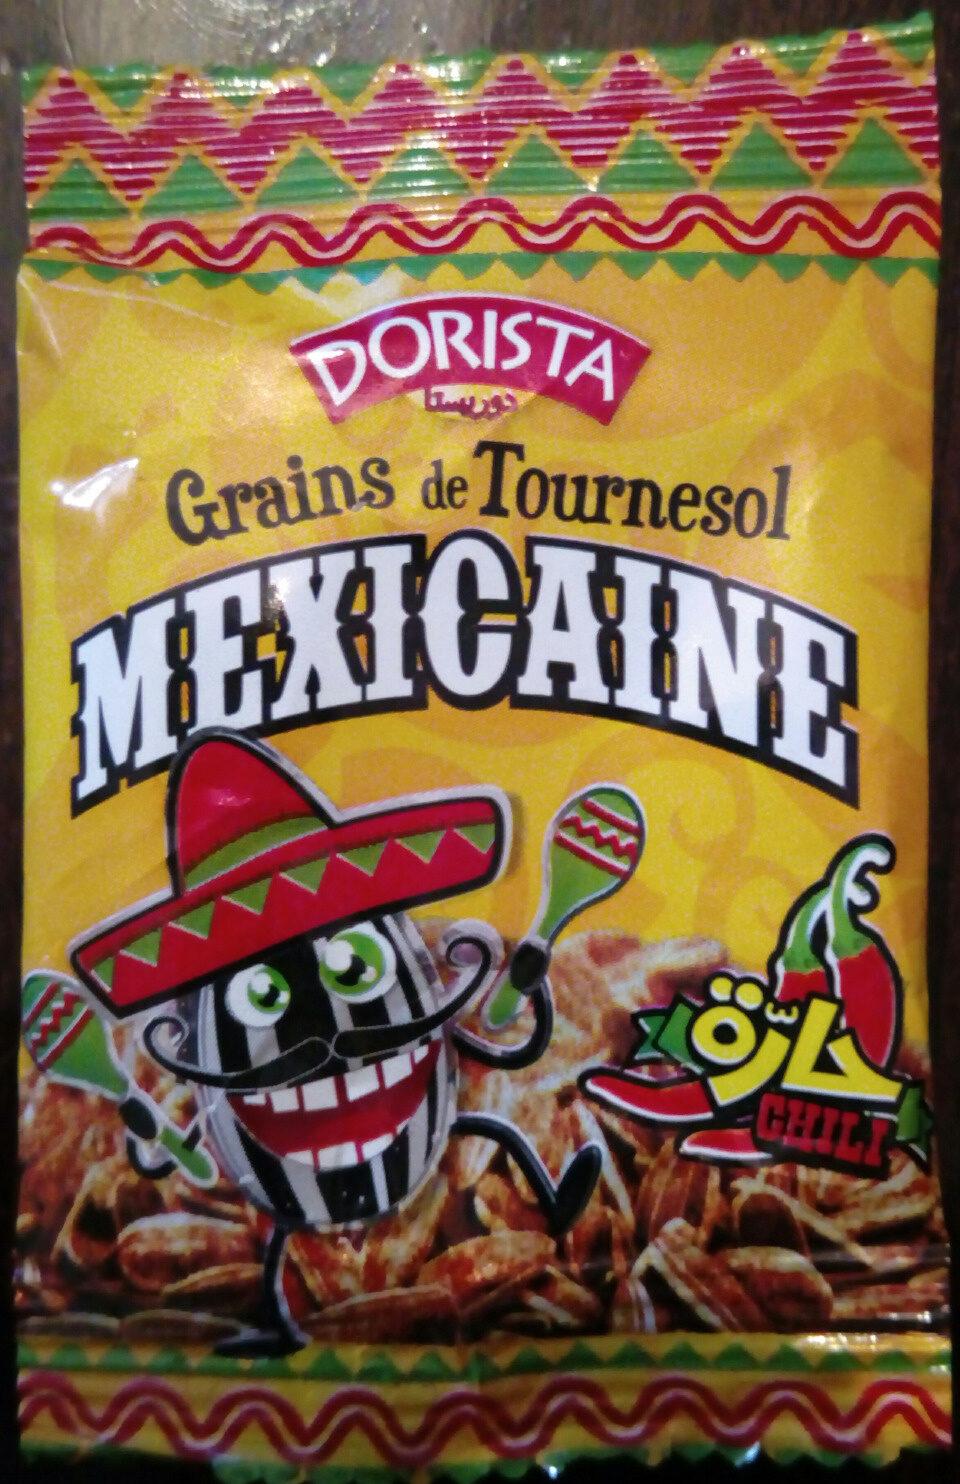 Grains de tournesol Mexicaine - نتاج - fr